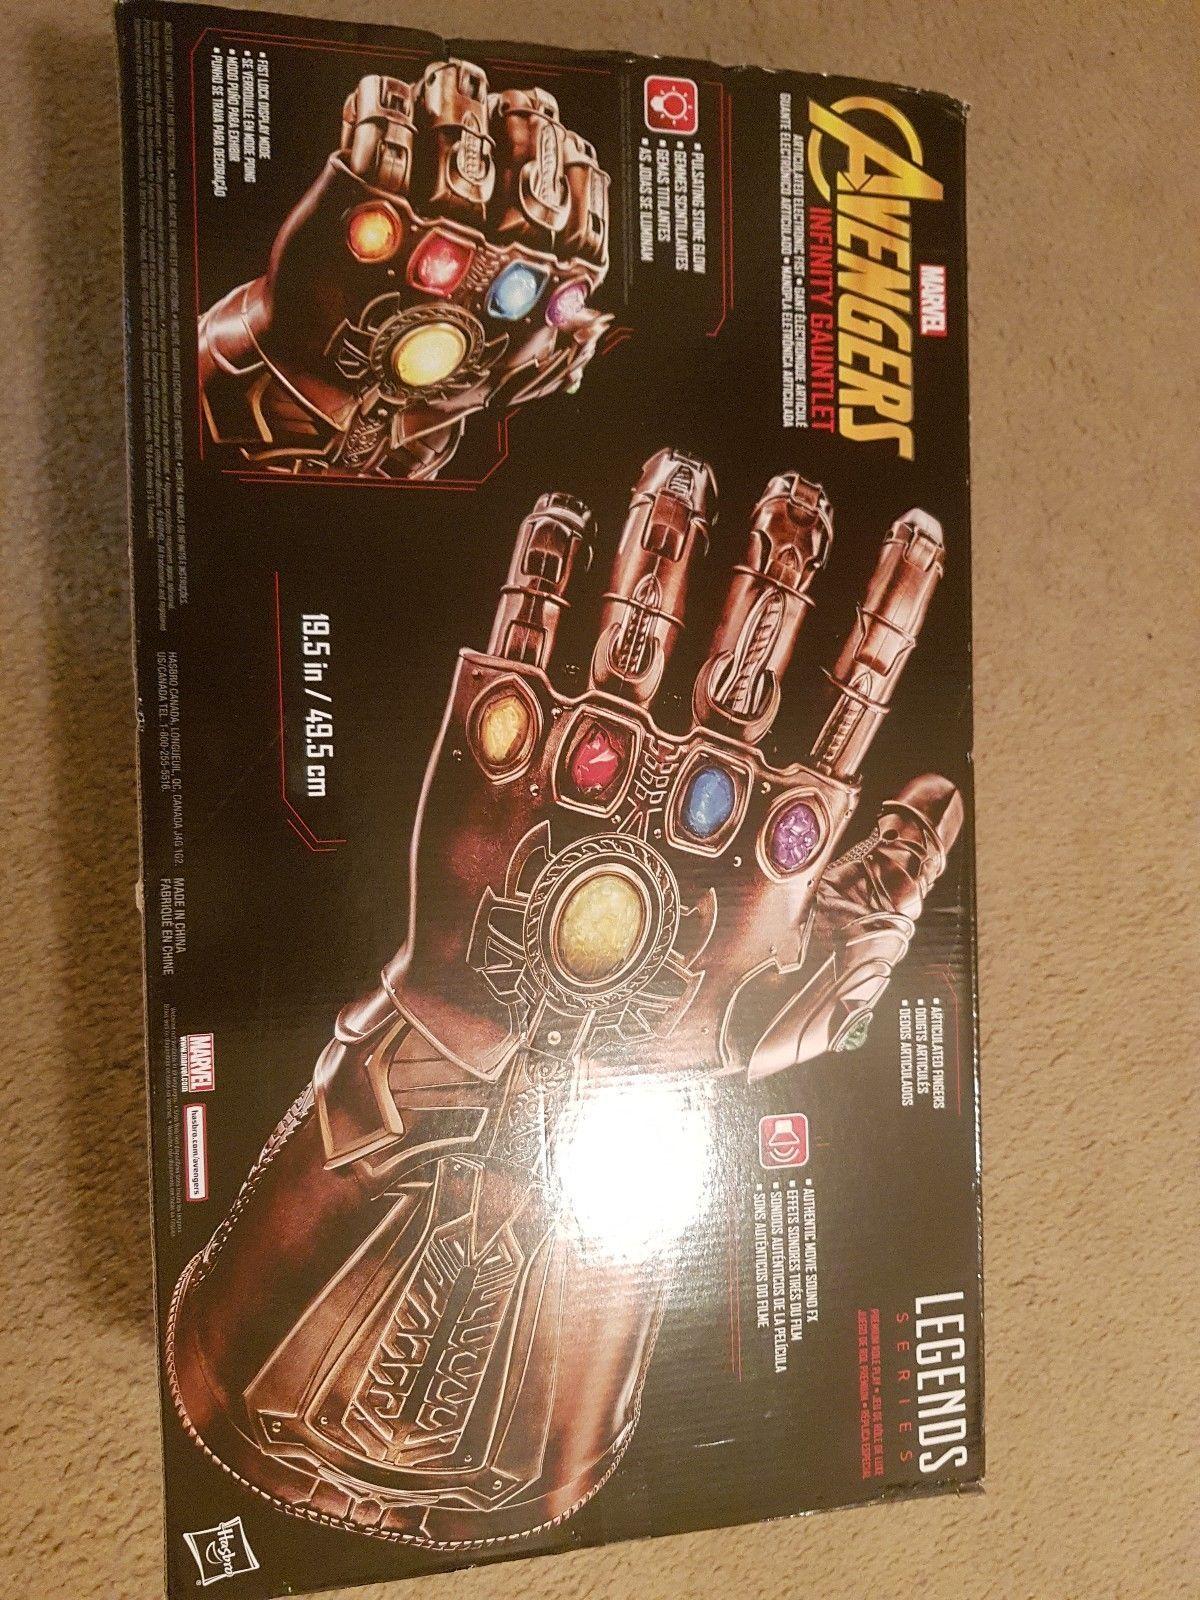 Marvel Legends Avengers Infinity Gauntlet Thanos - in Hand